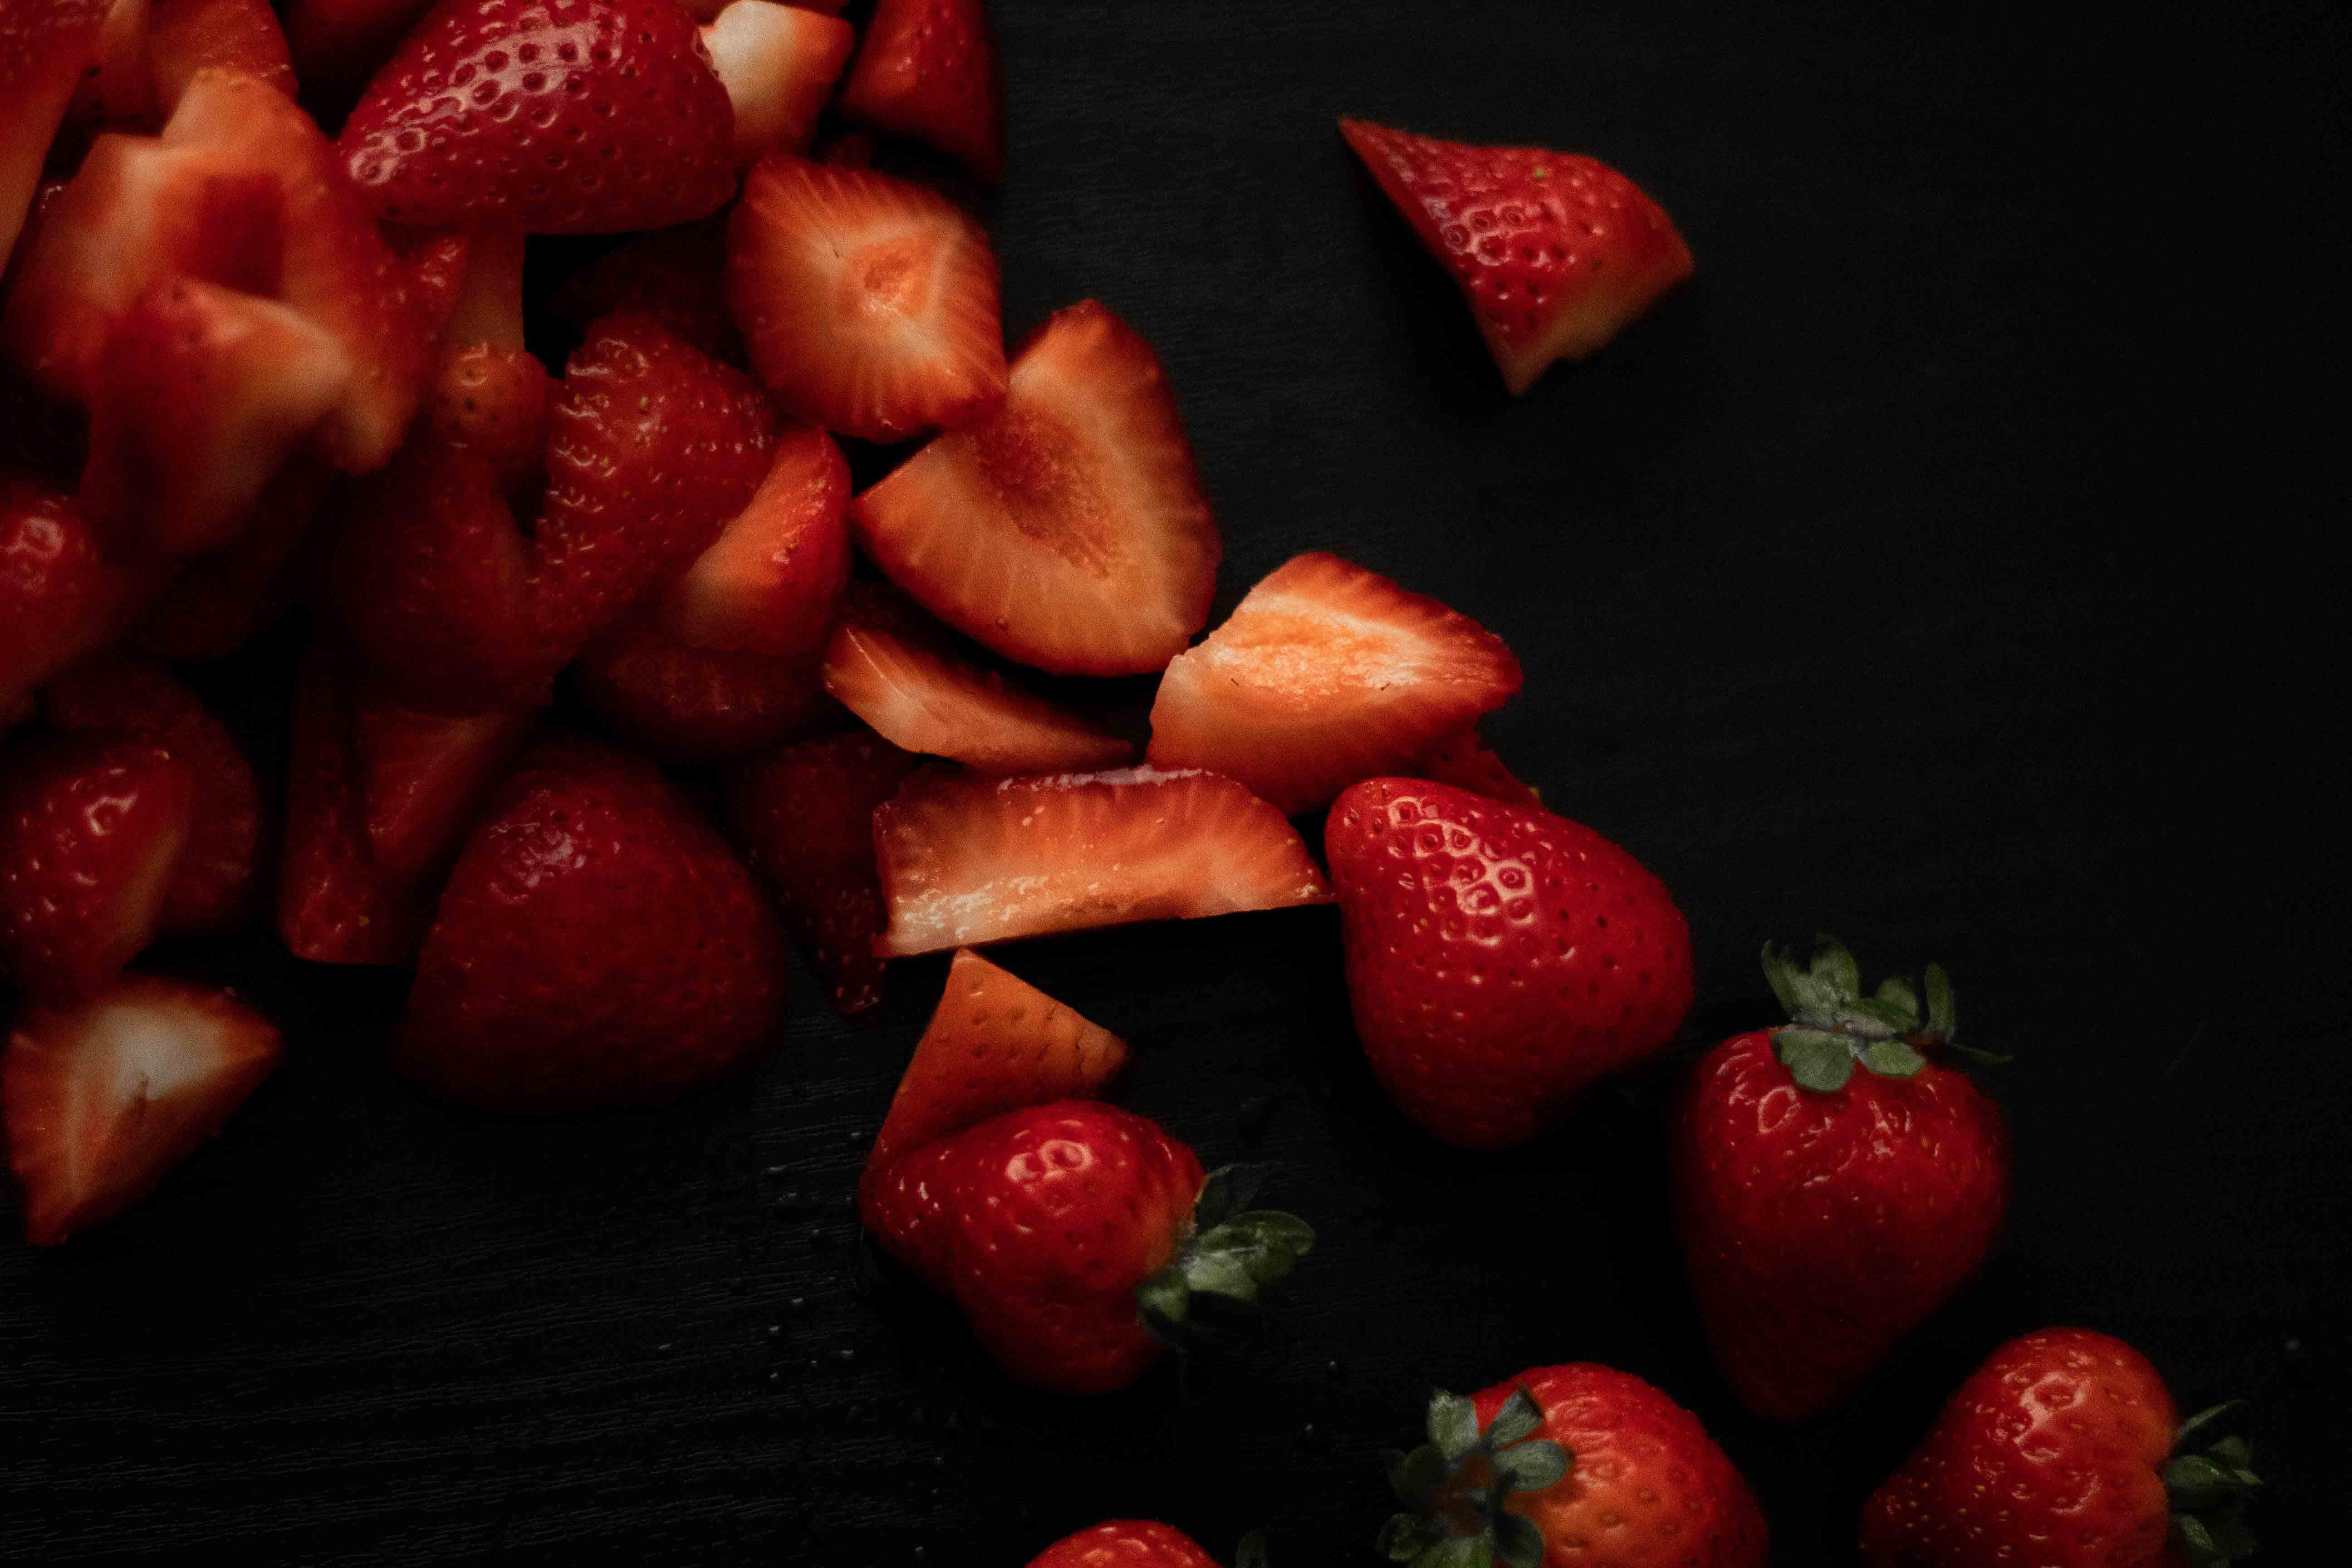 Tips Unik! Ini Cara Membekukan Buah-buahan agar Tidak Busuk sampai Setahun